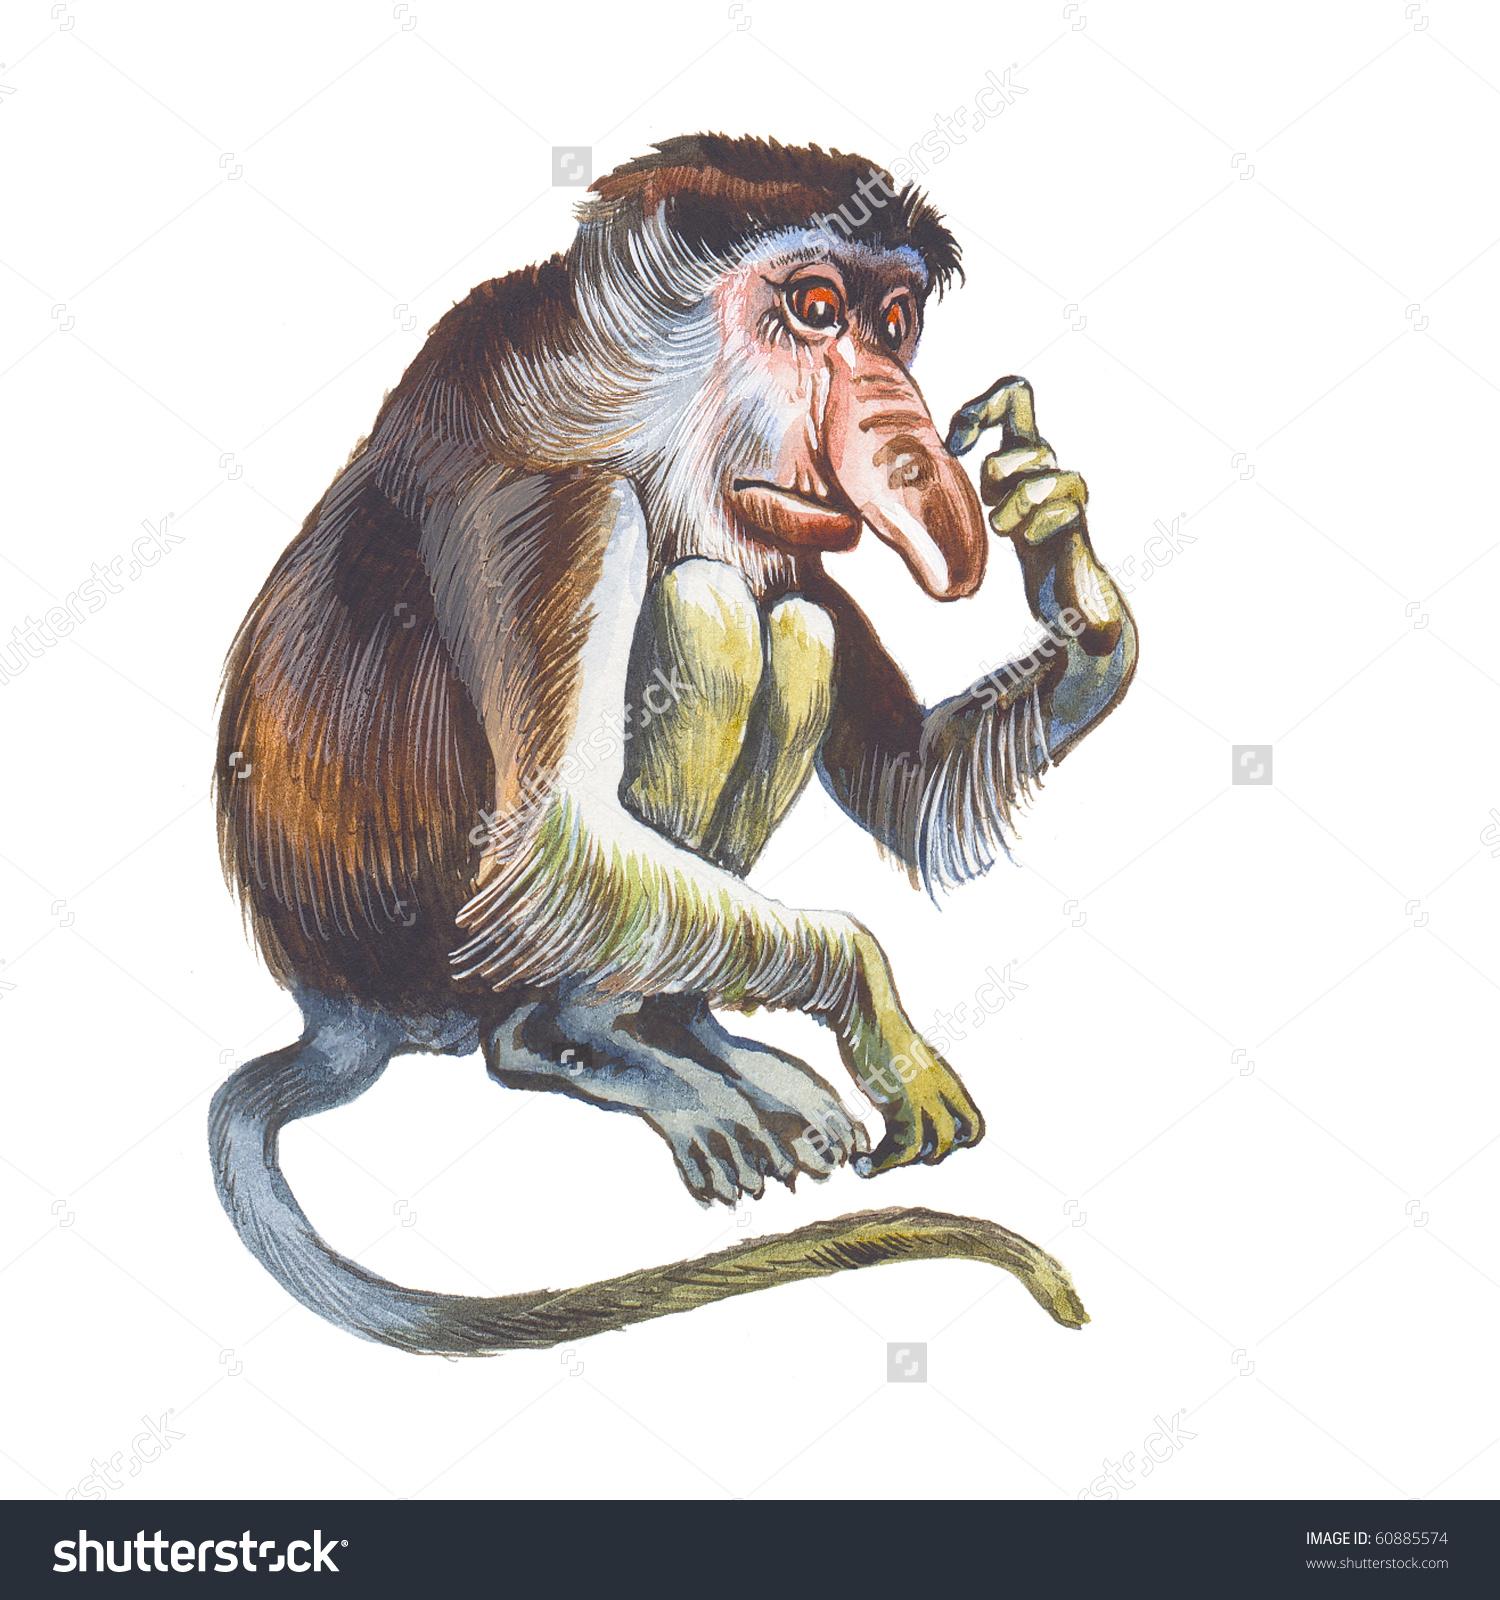 Proboscis Monkey clipart #1, Download drawings